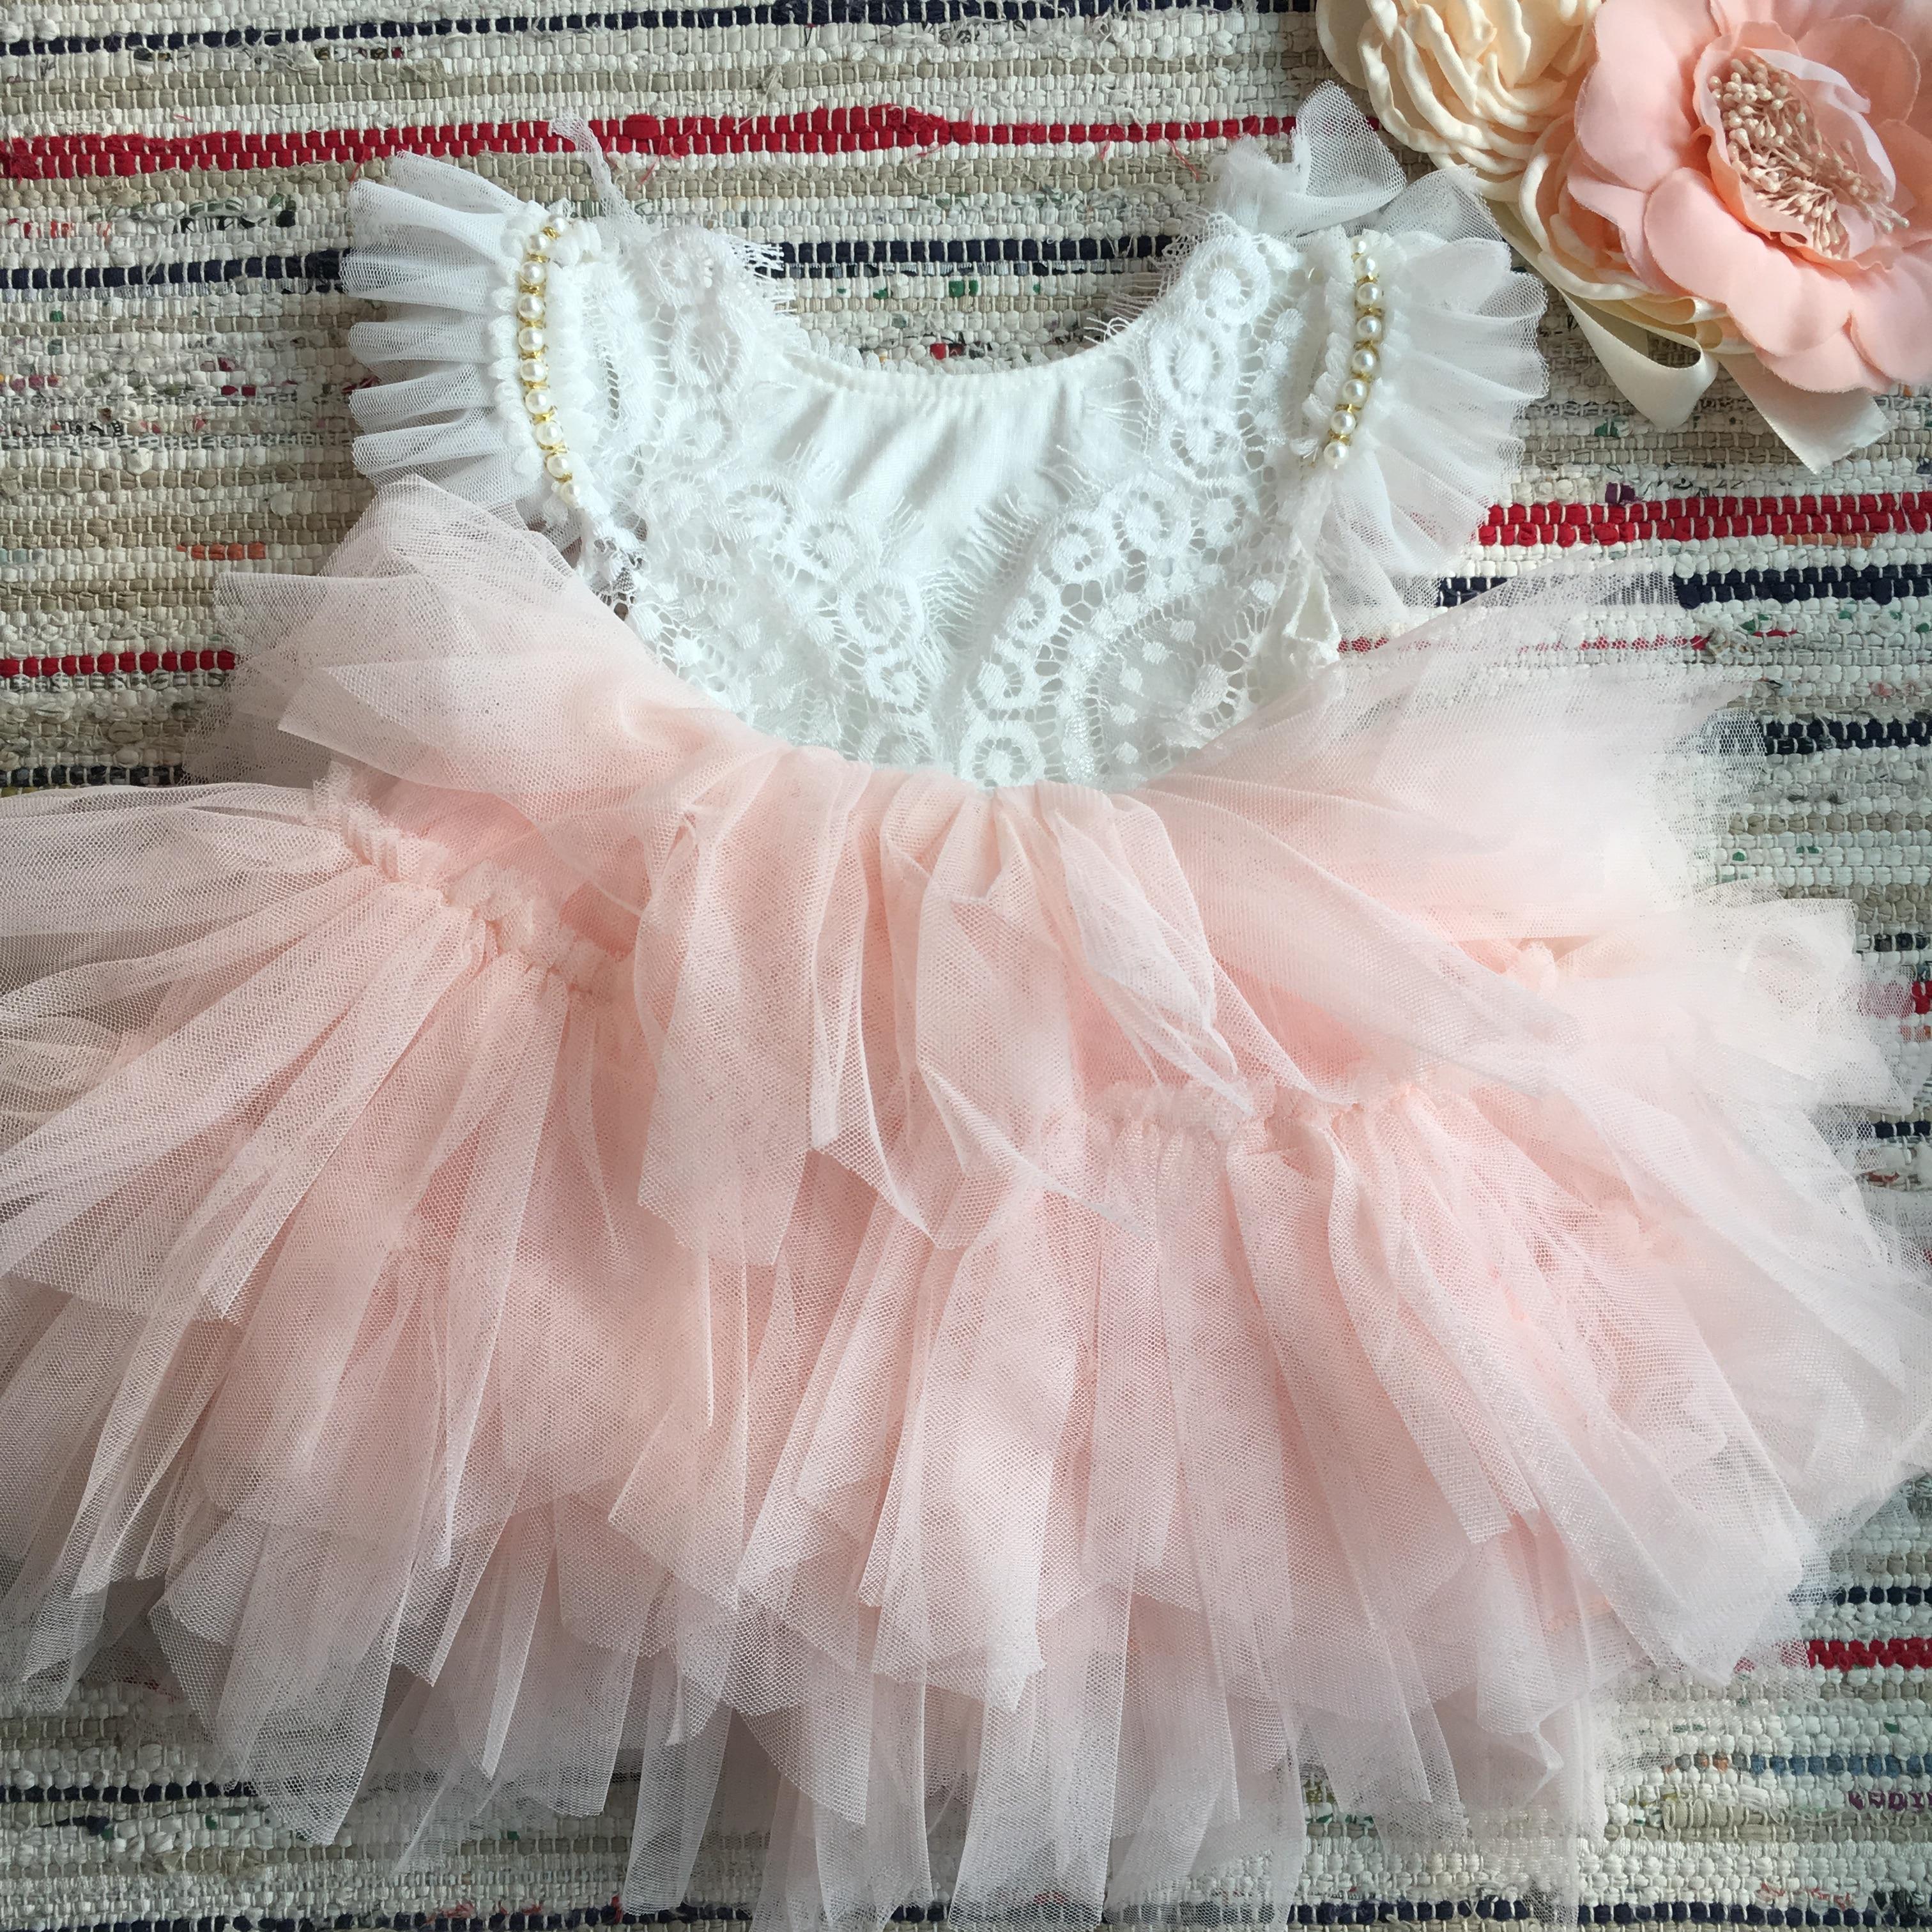 Retail Gorgeous Rhinestone Sashes Girl Evening Dress Baby Girl Lace Sling Princess Tutu Dress Kids Formal Costume 5